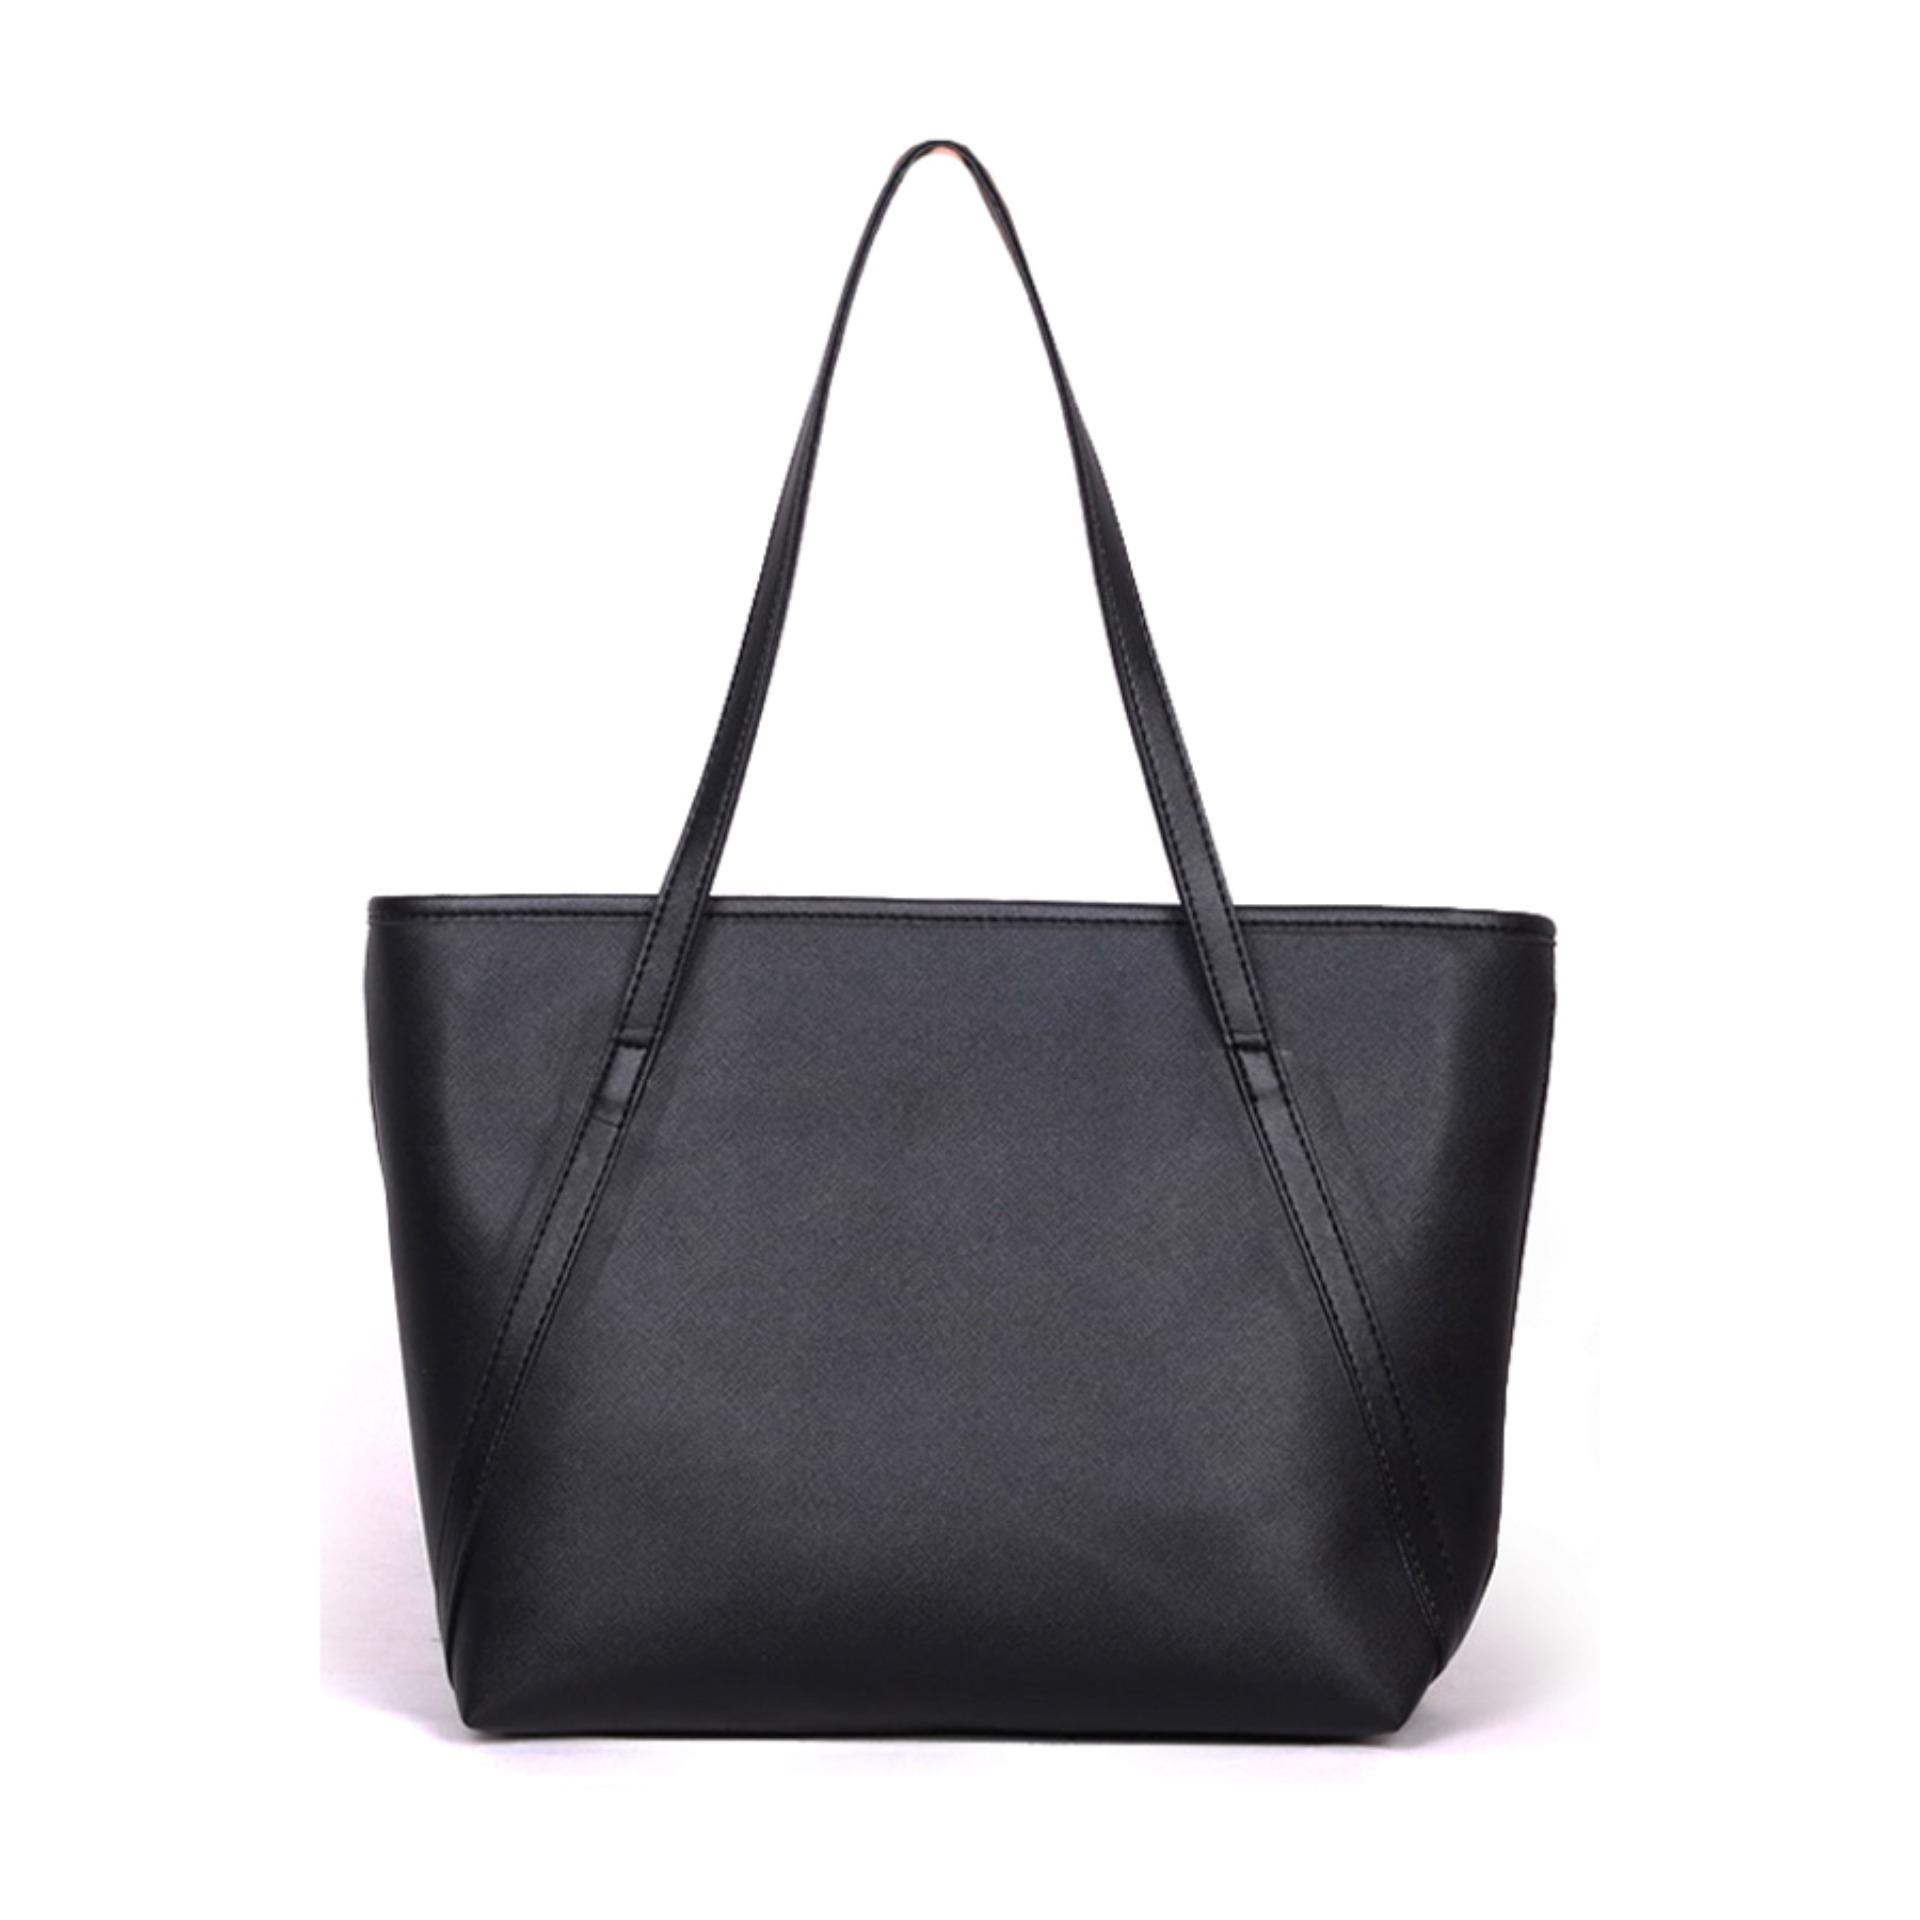 QuincyLabel Tas Wanita Women Fashion PU Tote Leather Handbags Shoulder Bags - Peach